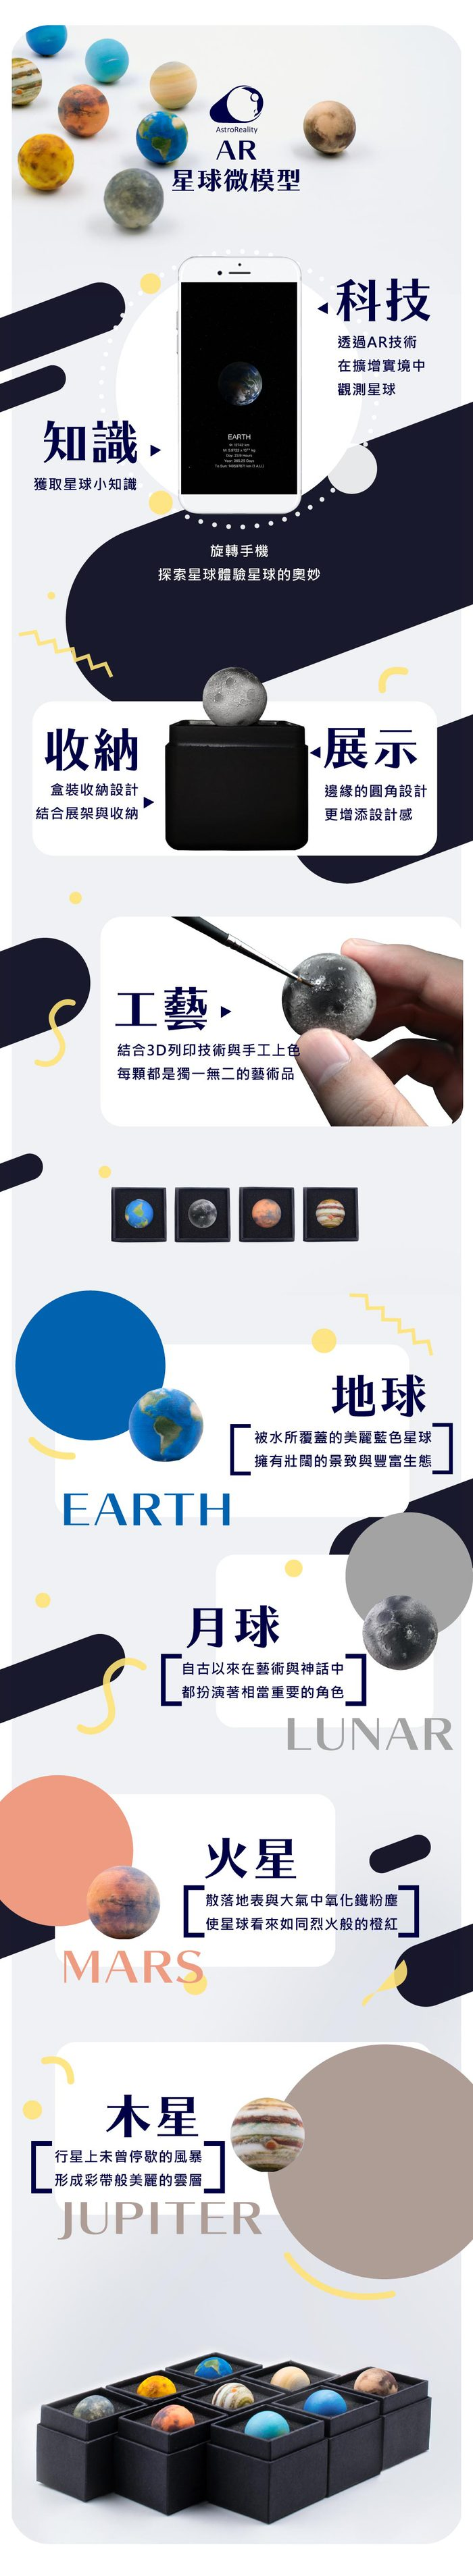 (複製)Astroreality |AR 火星筆記本